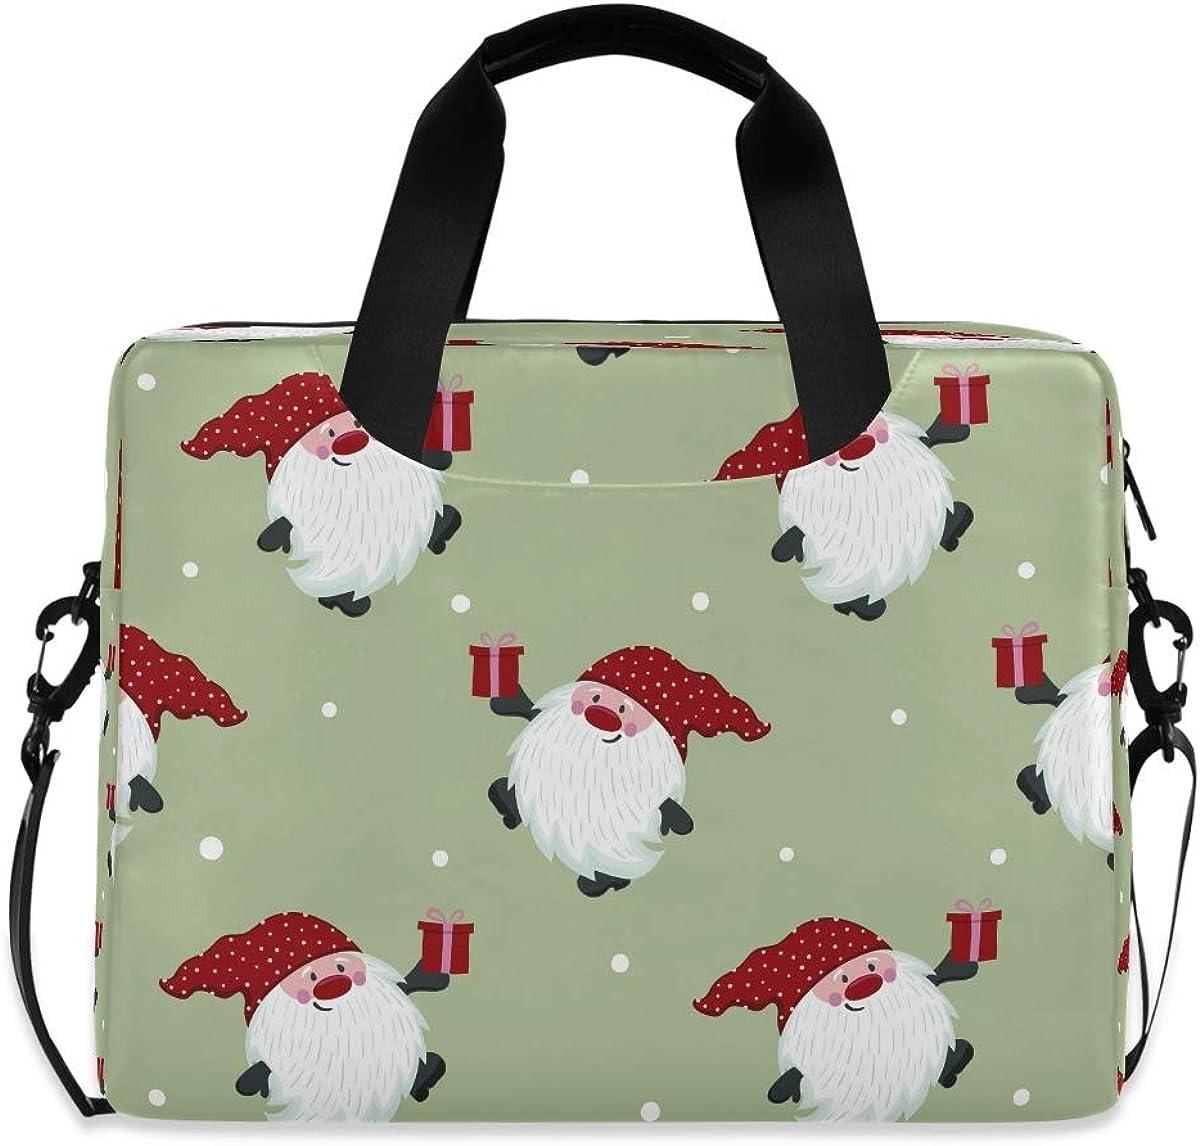 LELEGO Christmas Online Ranking TOP20 limited product Gift Santa Carry Laptop Shoulder Bag